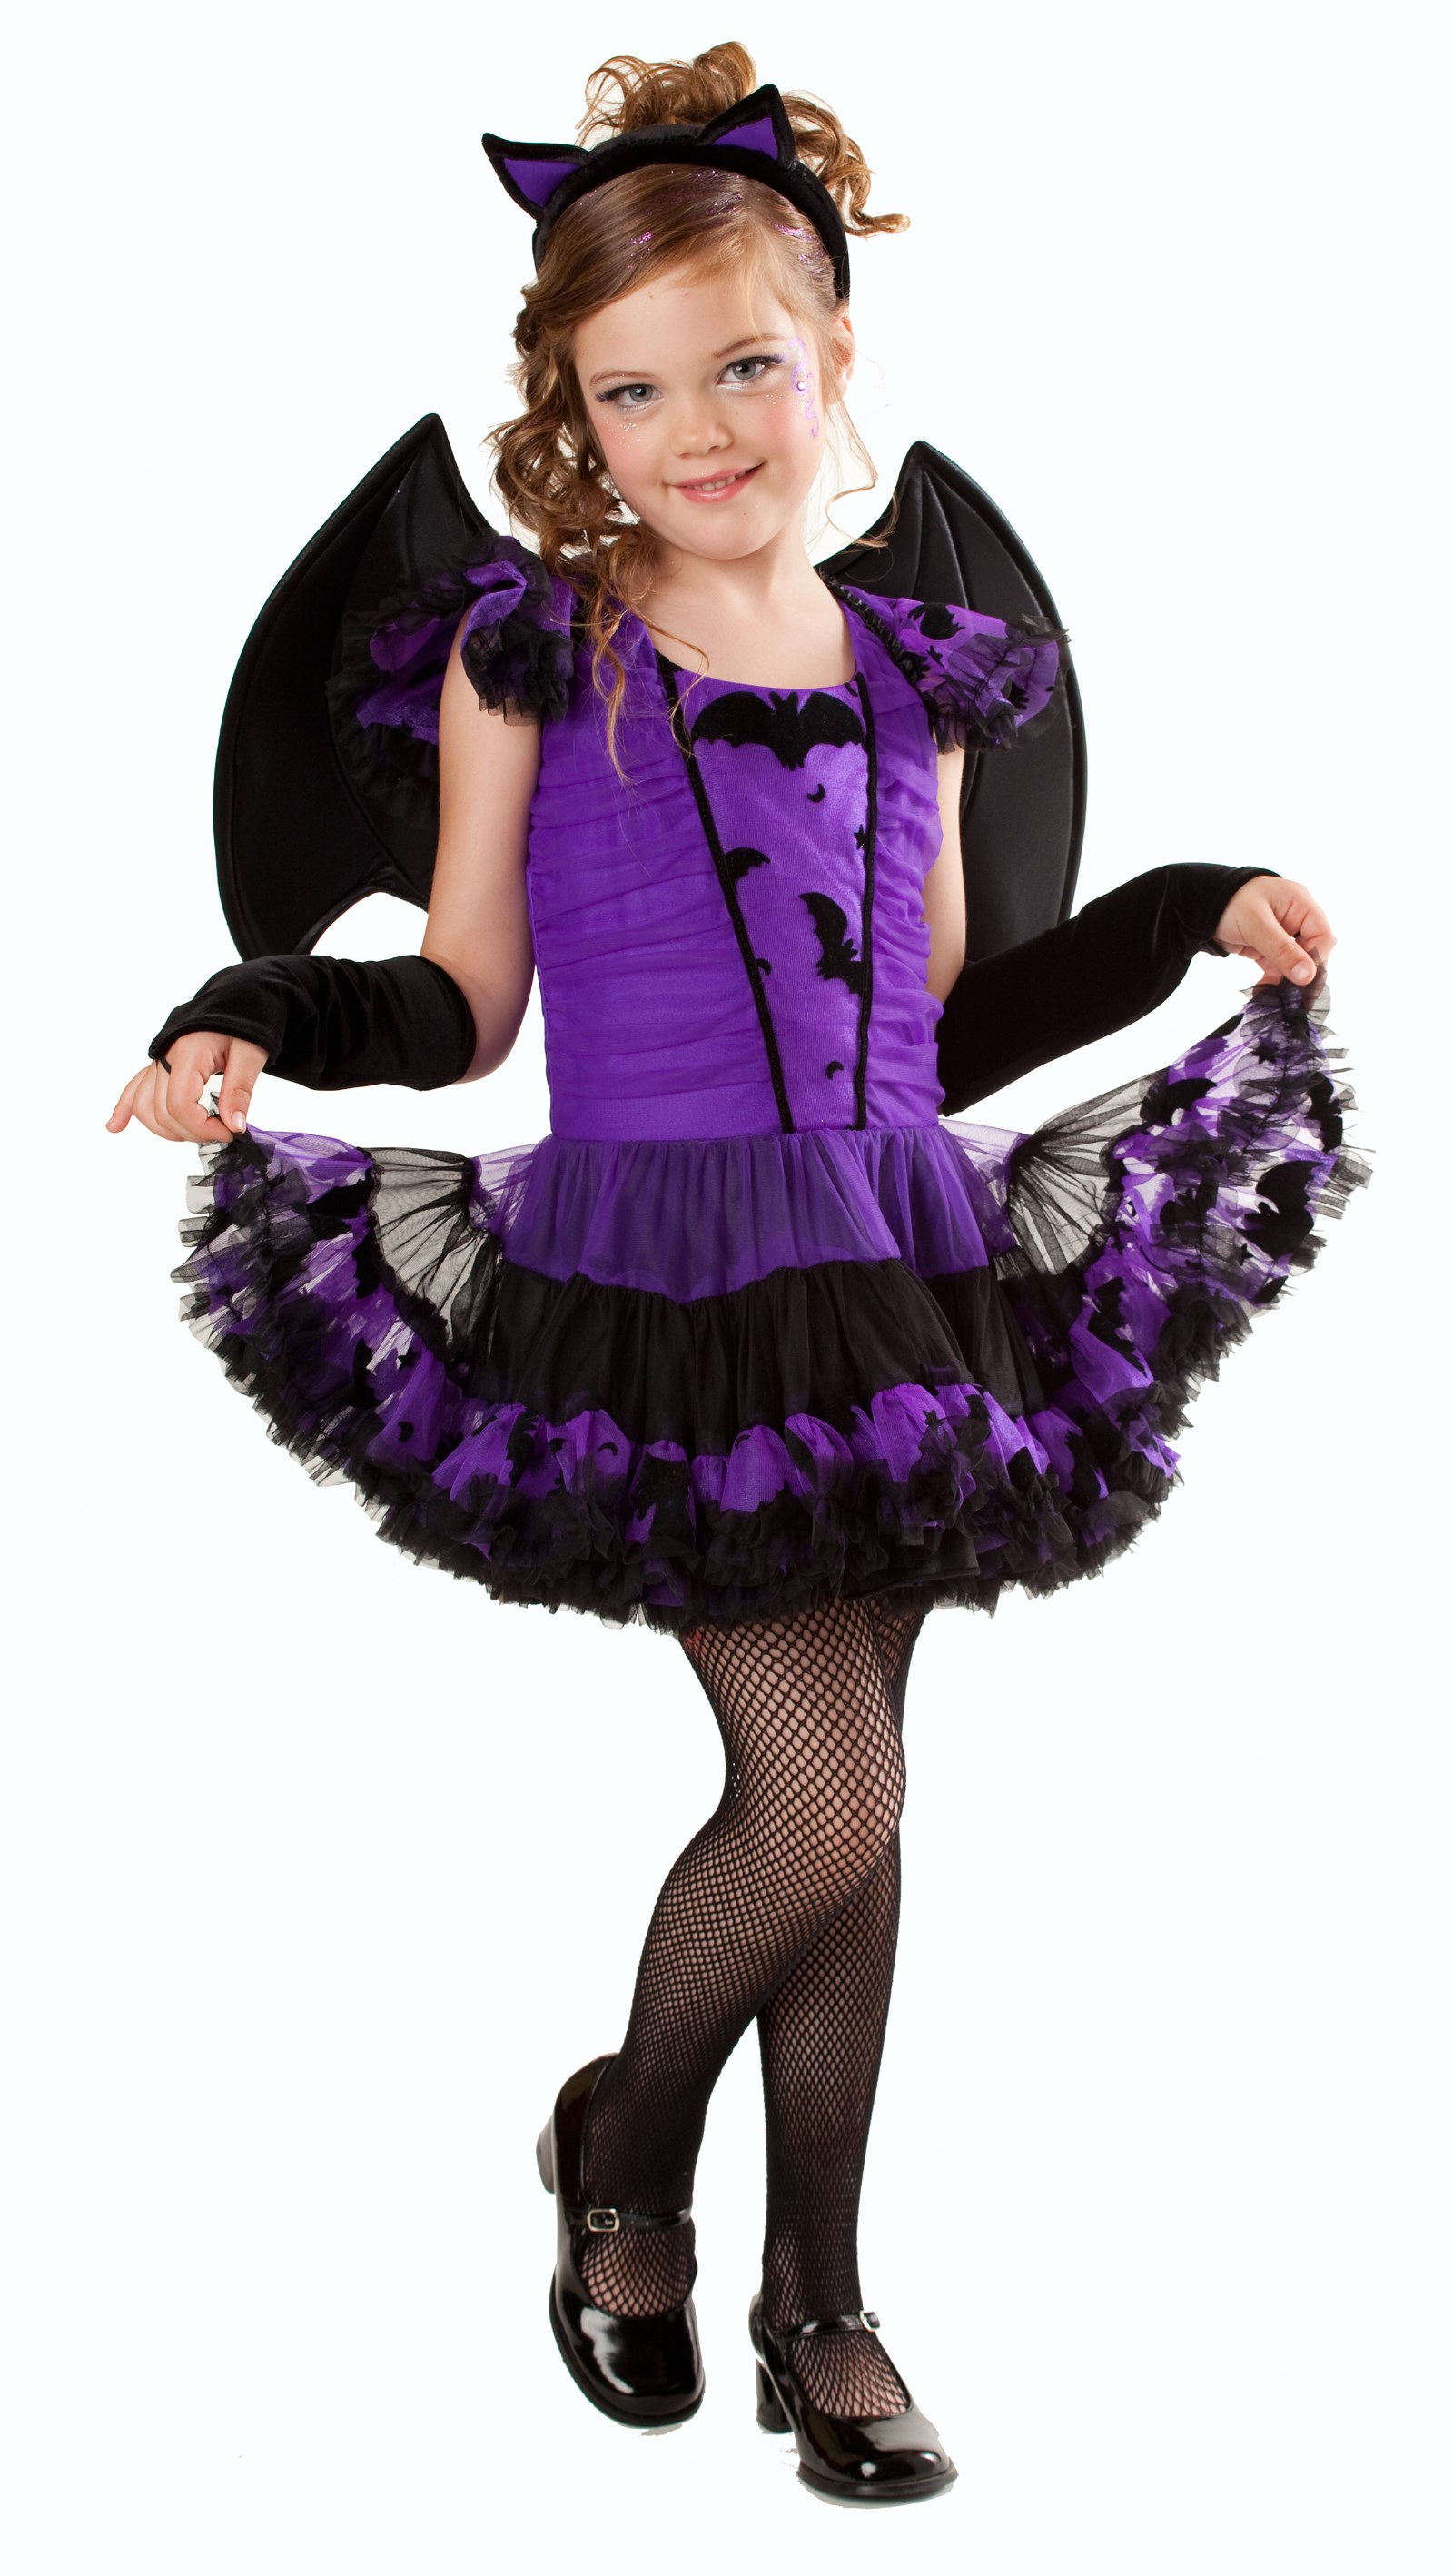 Baterina Child Costume - Female - Size Medium (8) HALLOWEEN COSTUMES Top Halloween Costume Shop.com